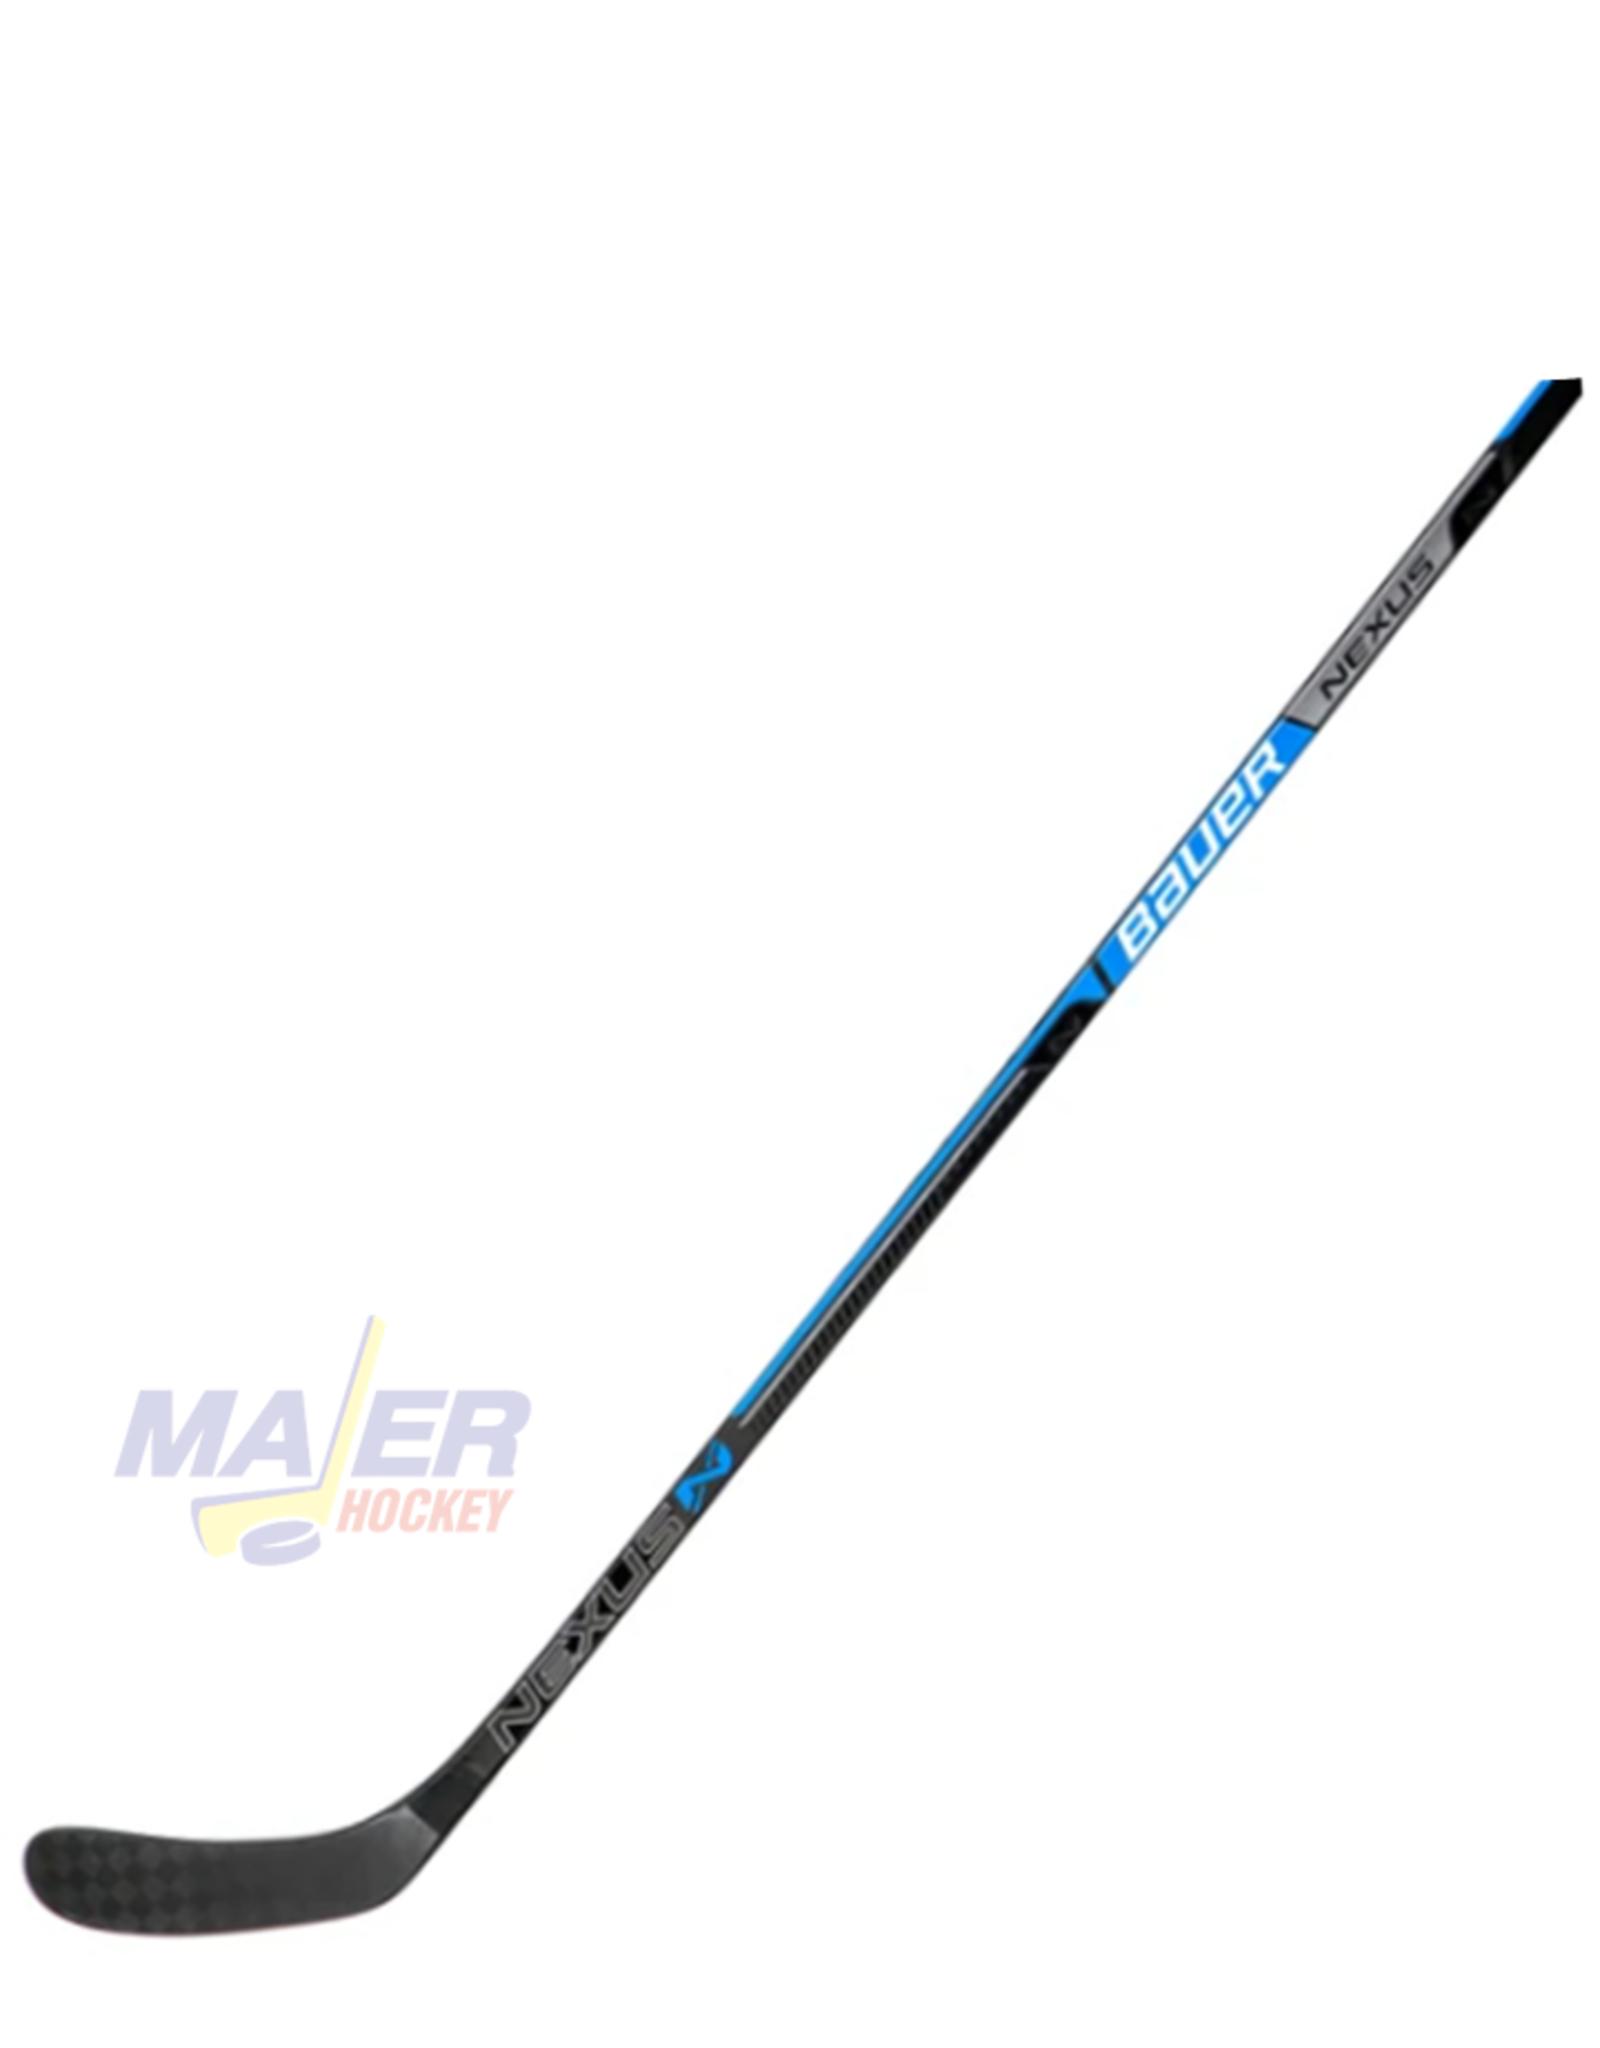 Bauer Nexus League Int Stick